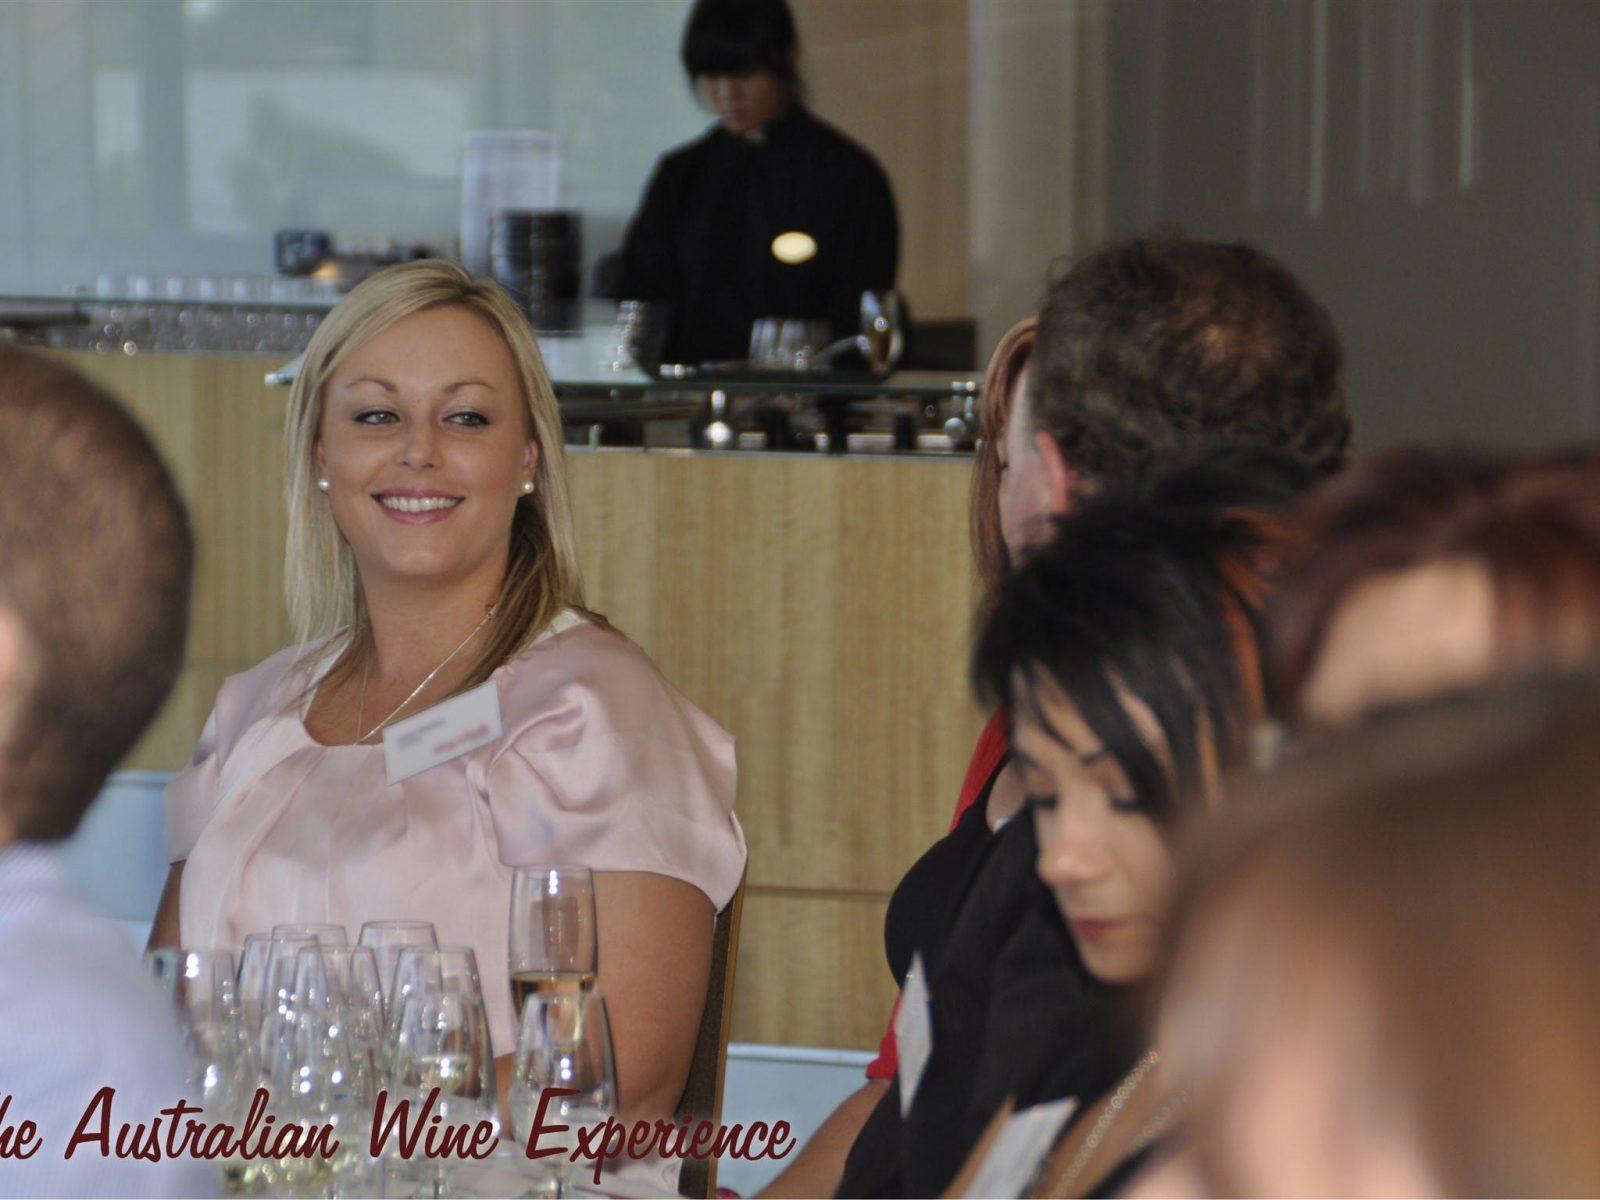 ATDW_Extra_Large_Landscape__9364315_GV24_Slider__The_Australian_Wine_Experience_IMAGE_1.jpg